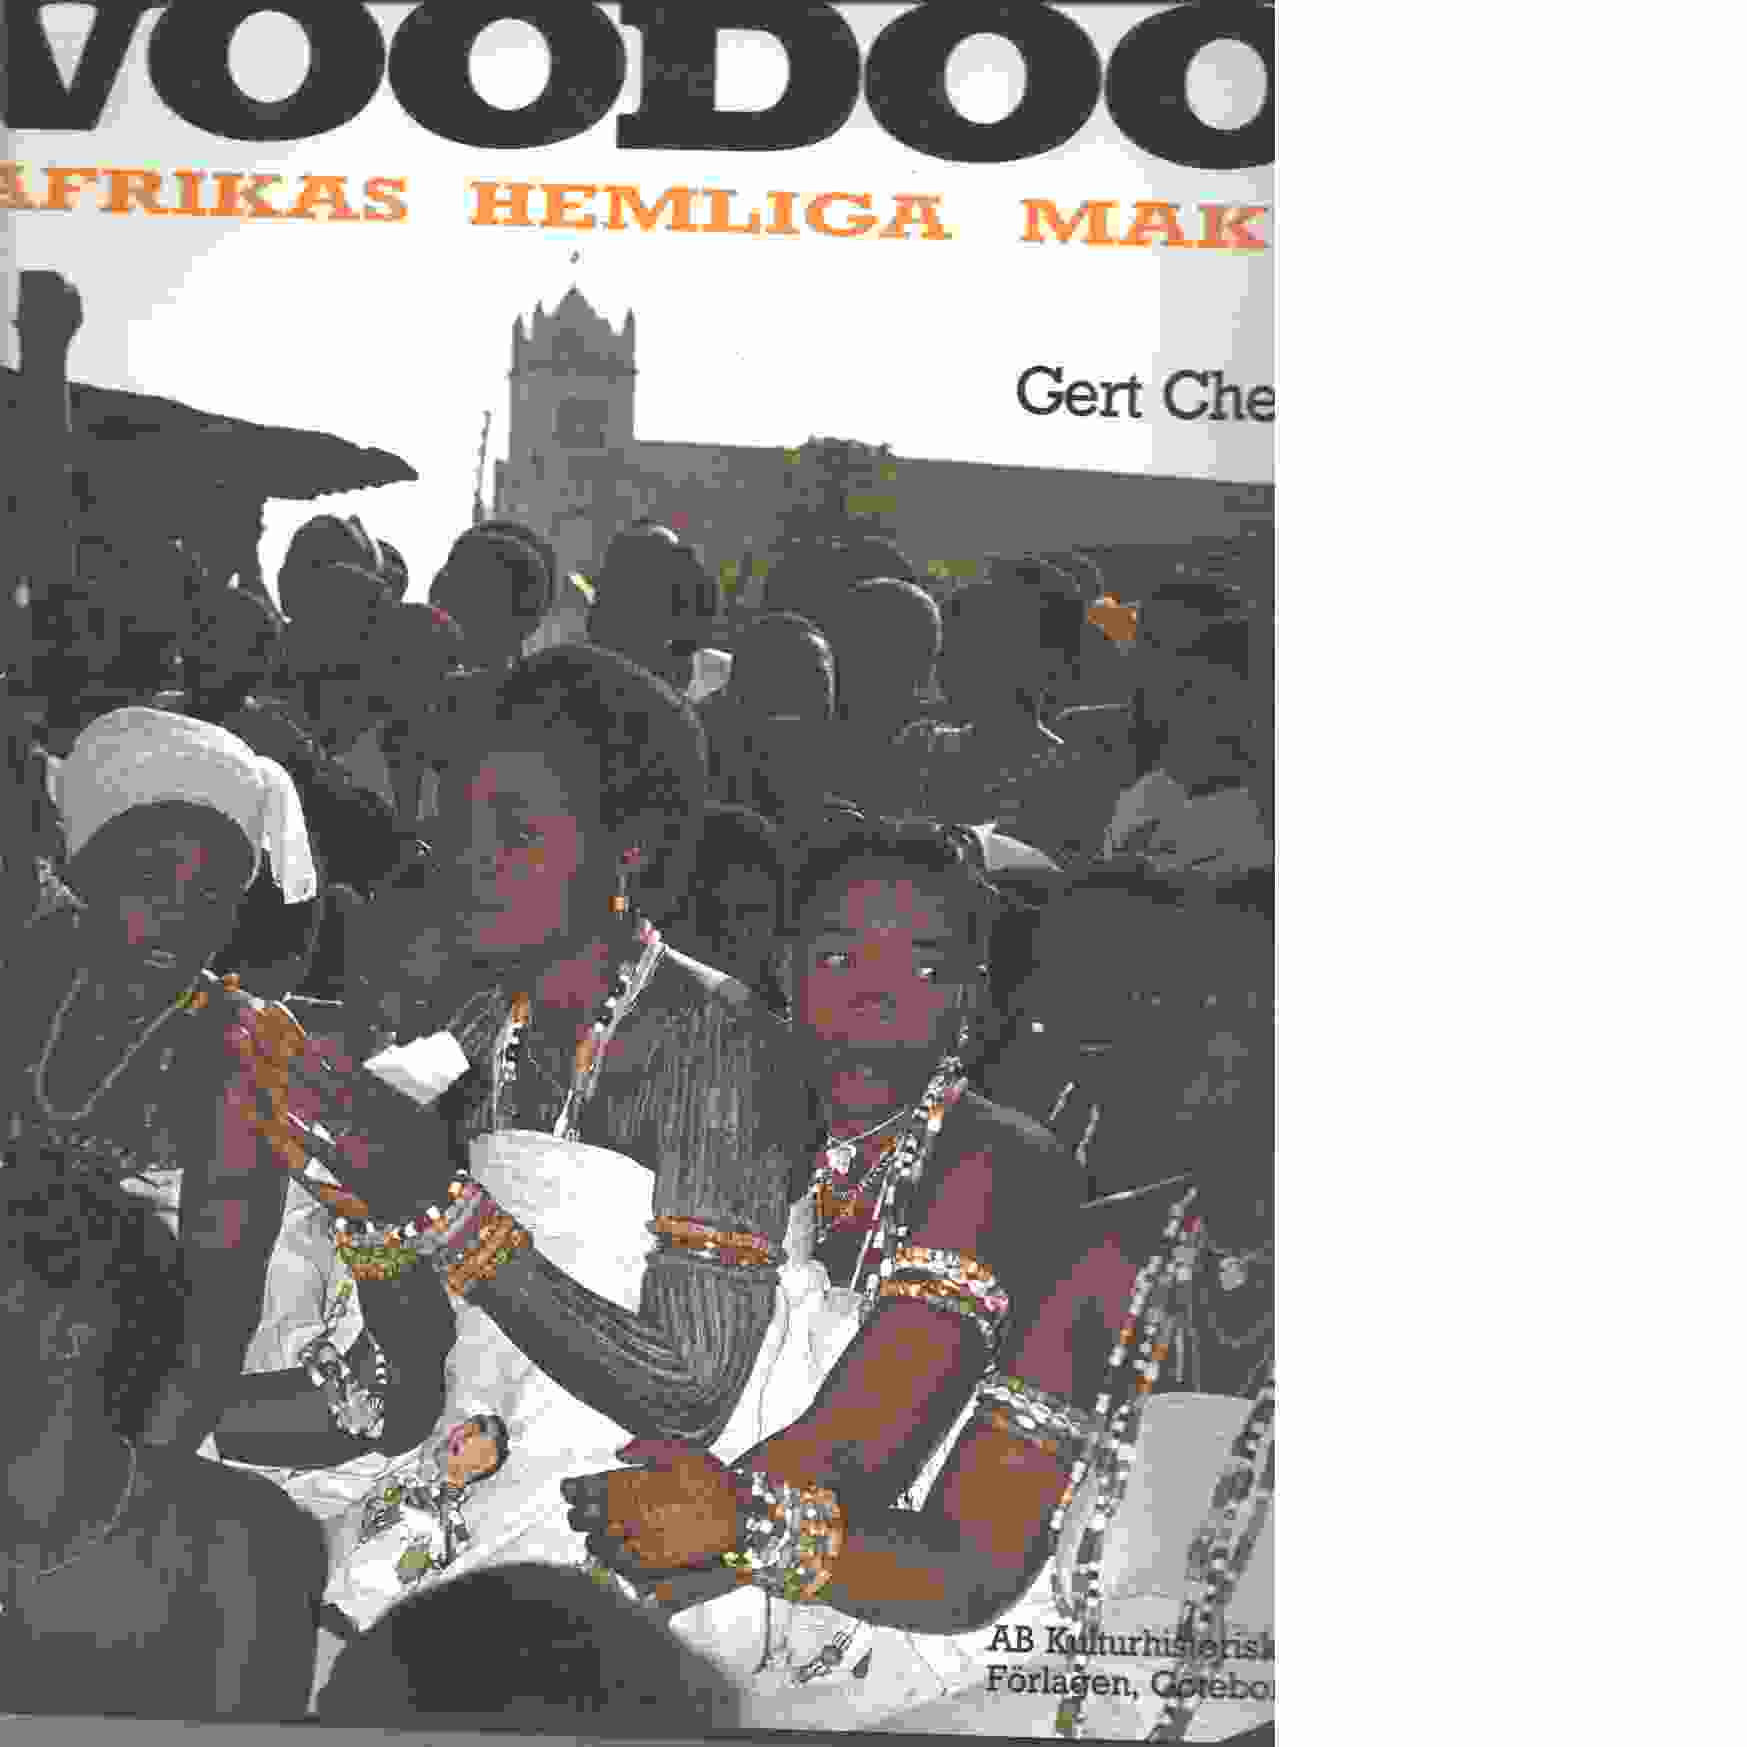 Voodoo : Afrikas hemliga makt  - Chesi, Gert